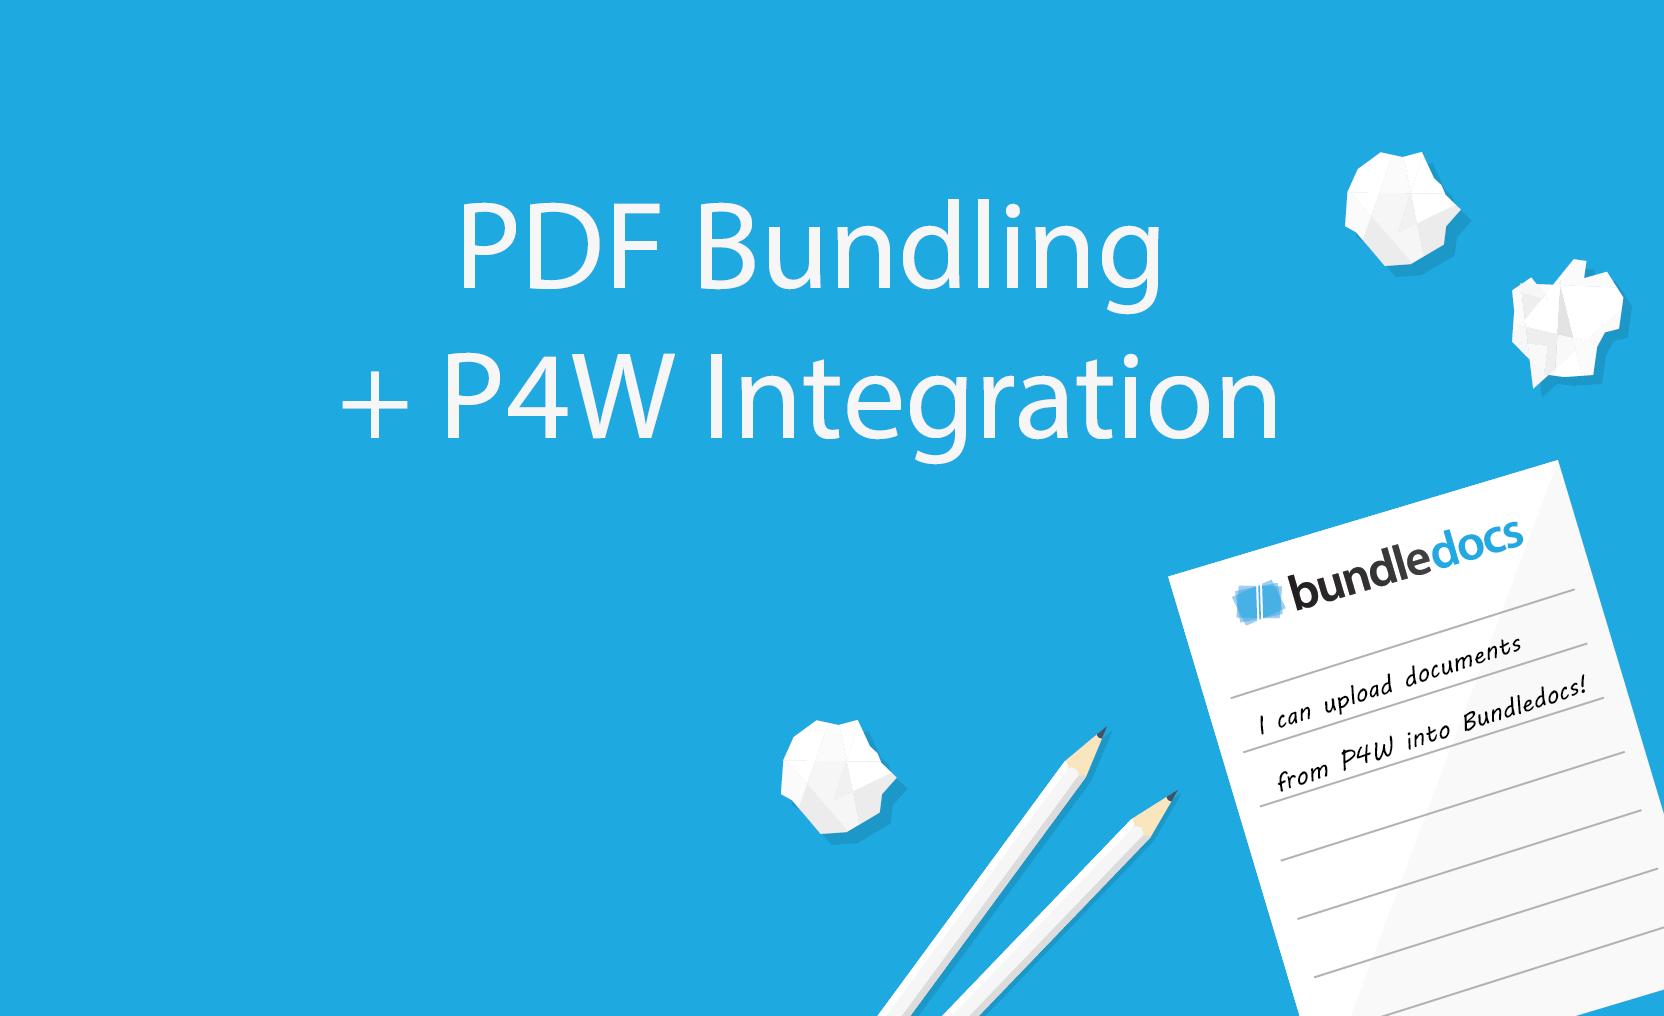 PDF Bundling has never been easier with Bundledocs